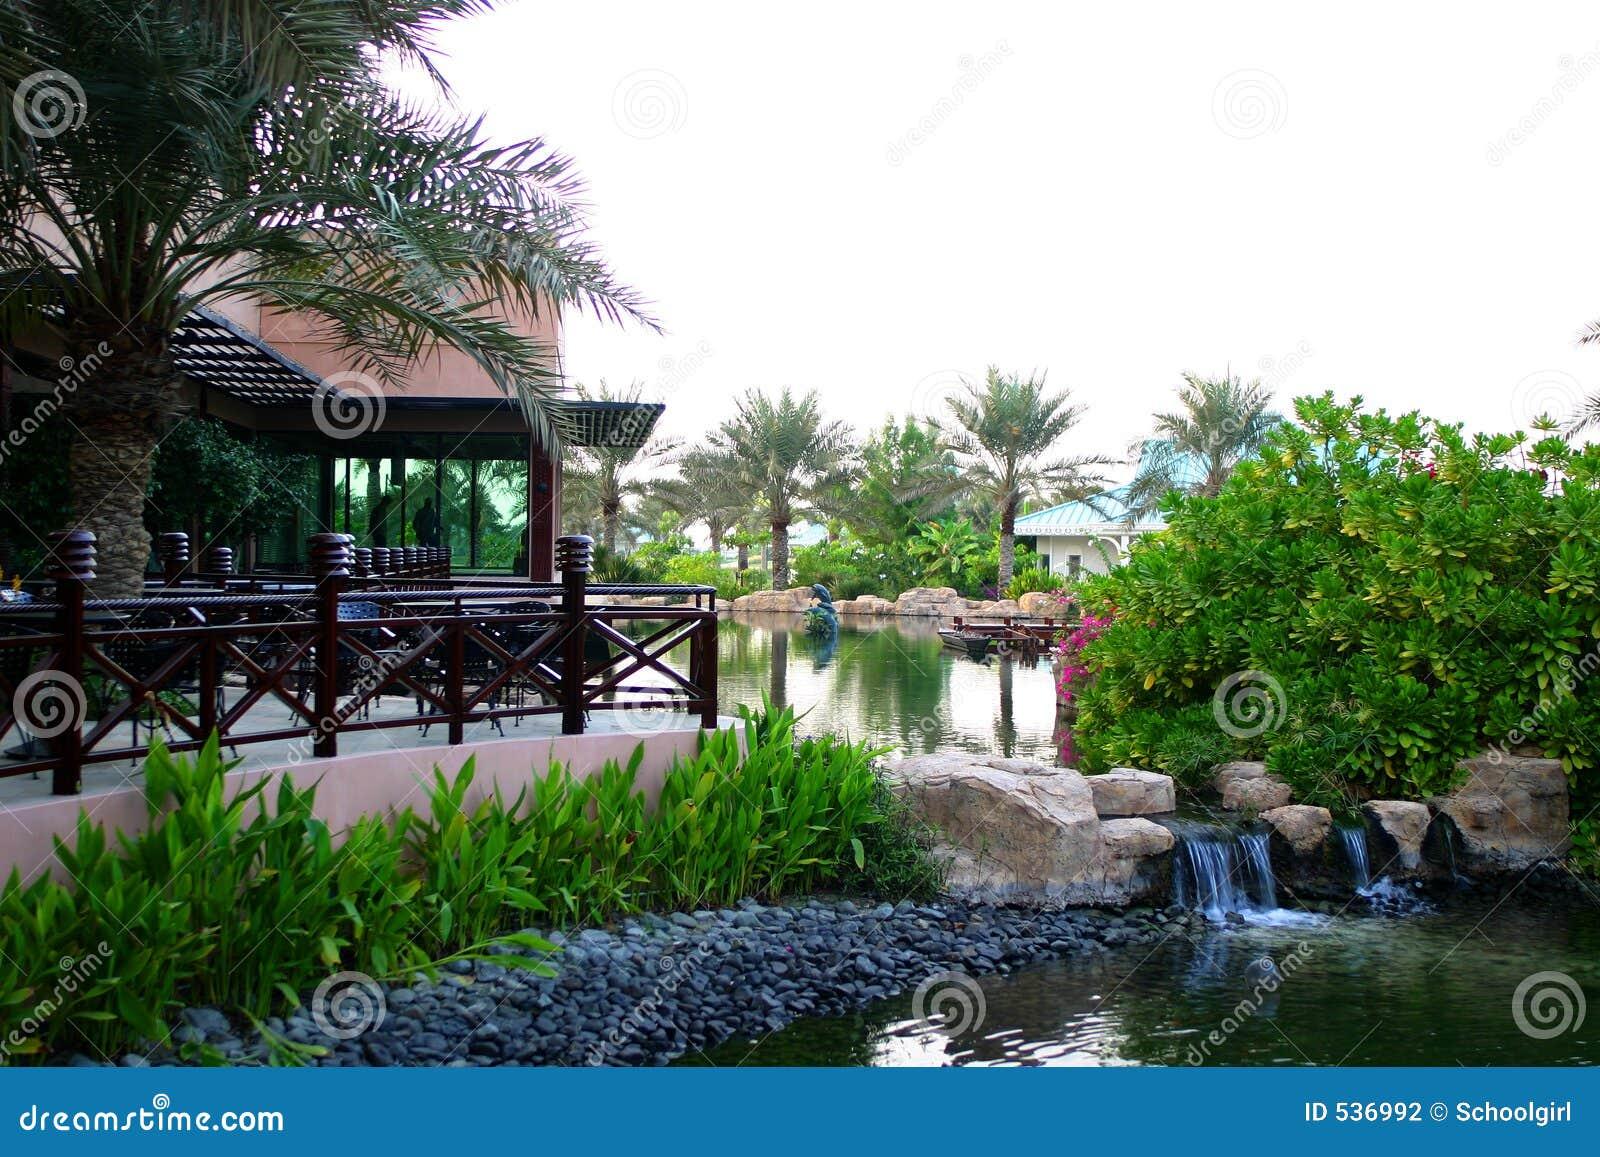 Download 池塘餐馆大阳台 库存照片. 图片 包括有 池塘, 玻璃, 掌上型计算机, 等候人员, 餐馆, 石头, 屋顶, 灌木 - 536992